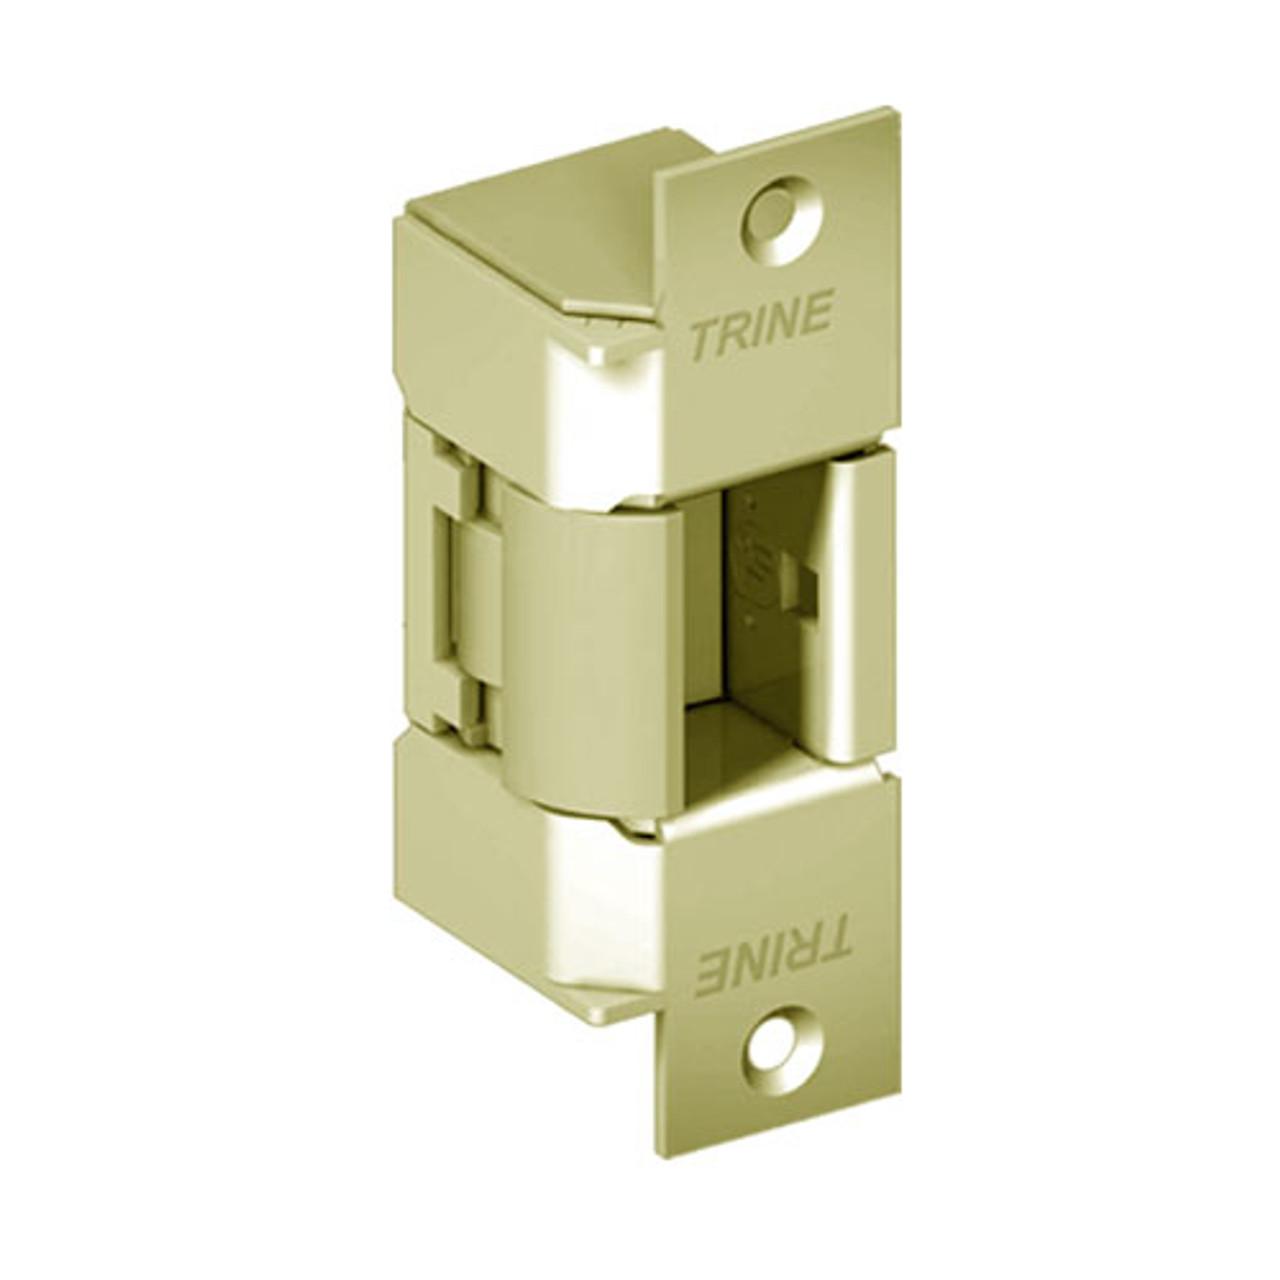 EN400-24AC-US4-LH Trine EN Series Outdoor Electric Strikes Solution in Satin Brass Finish